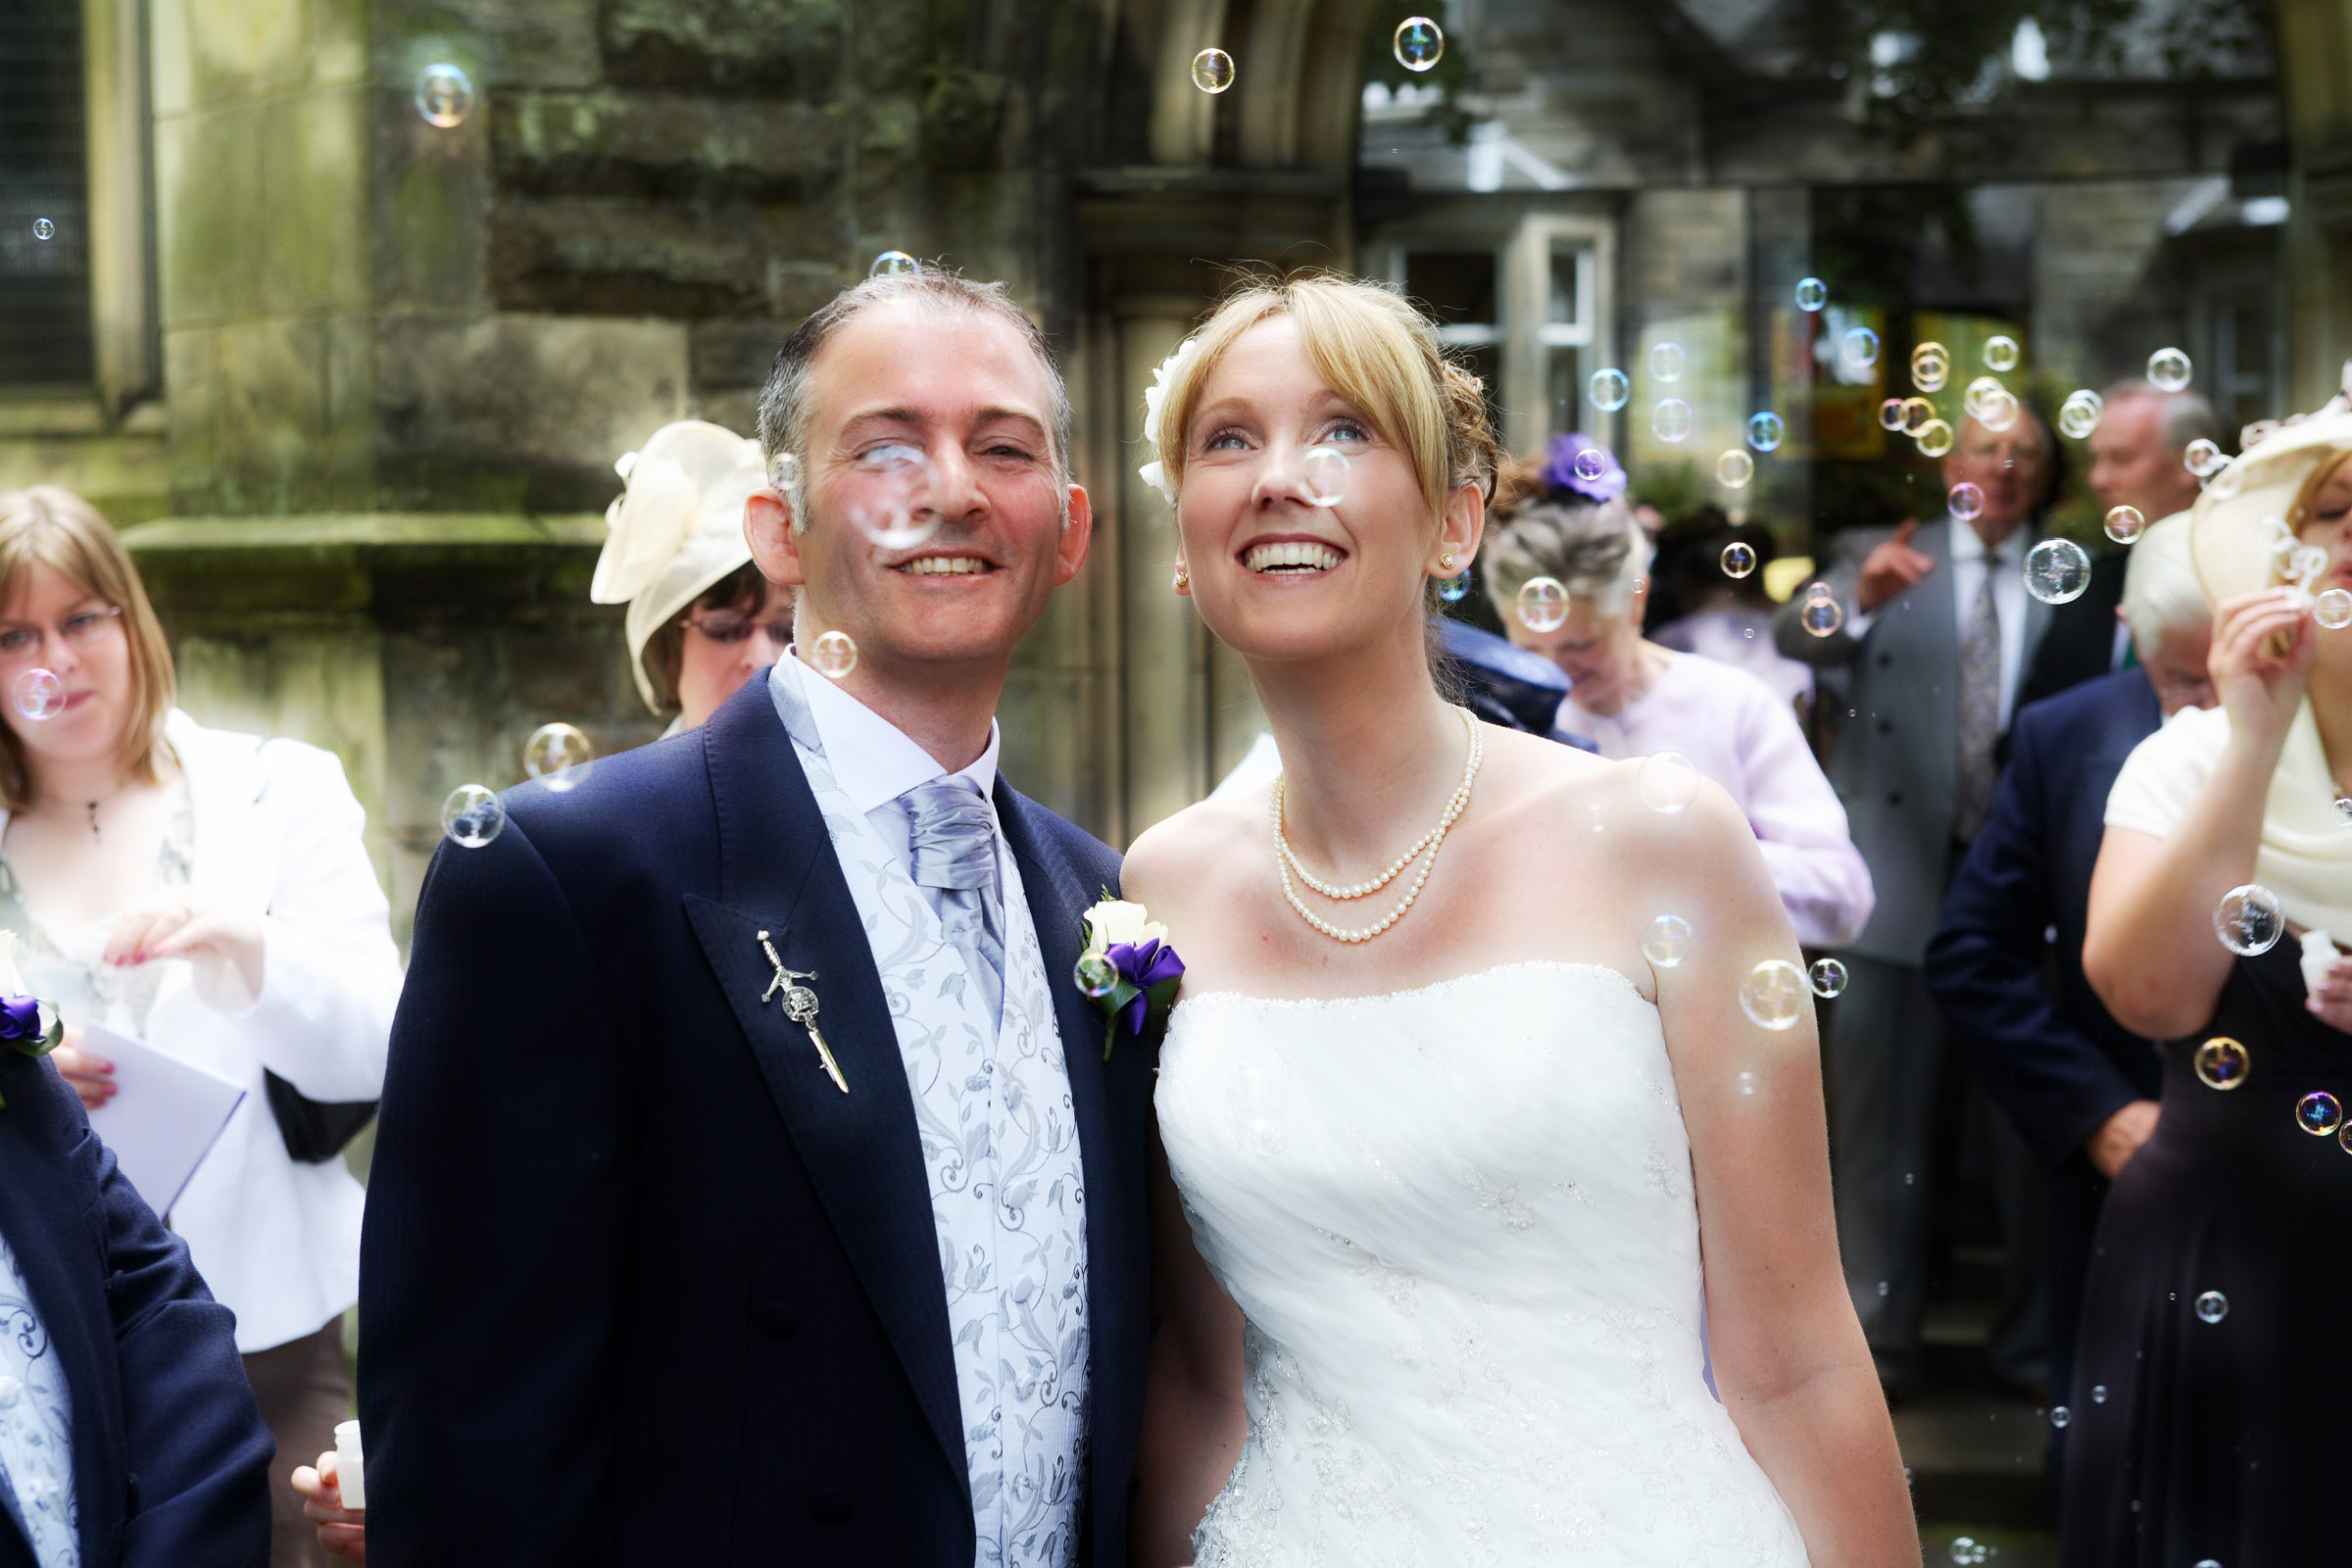 Editorial_Wedding_Edinburgh_Photographer_banner04.jpg